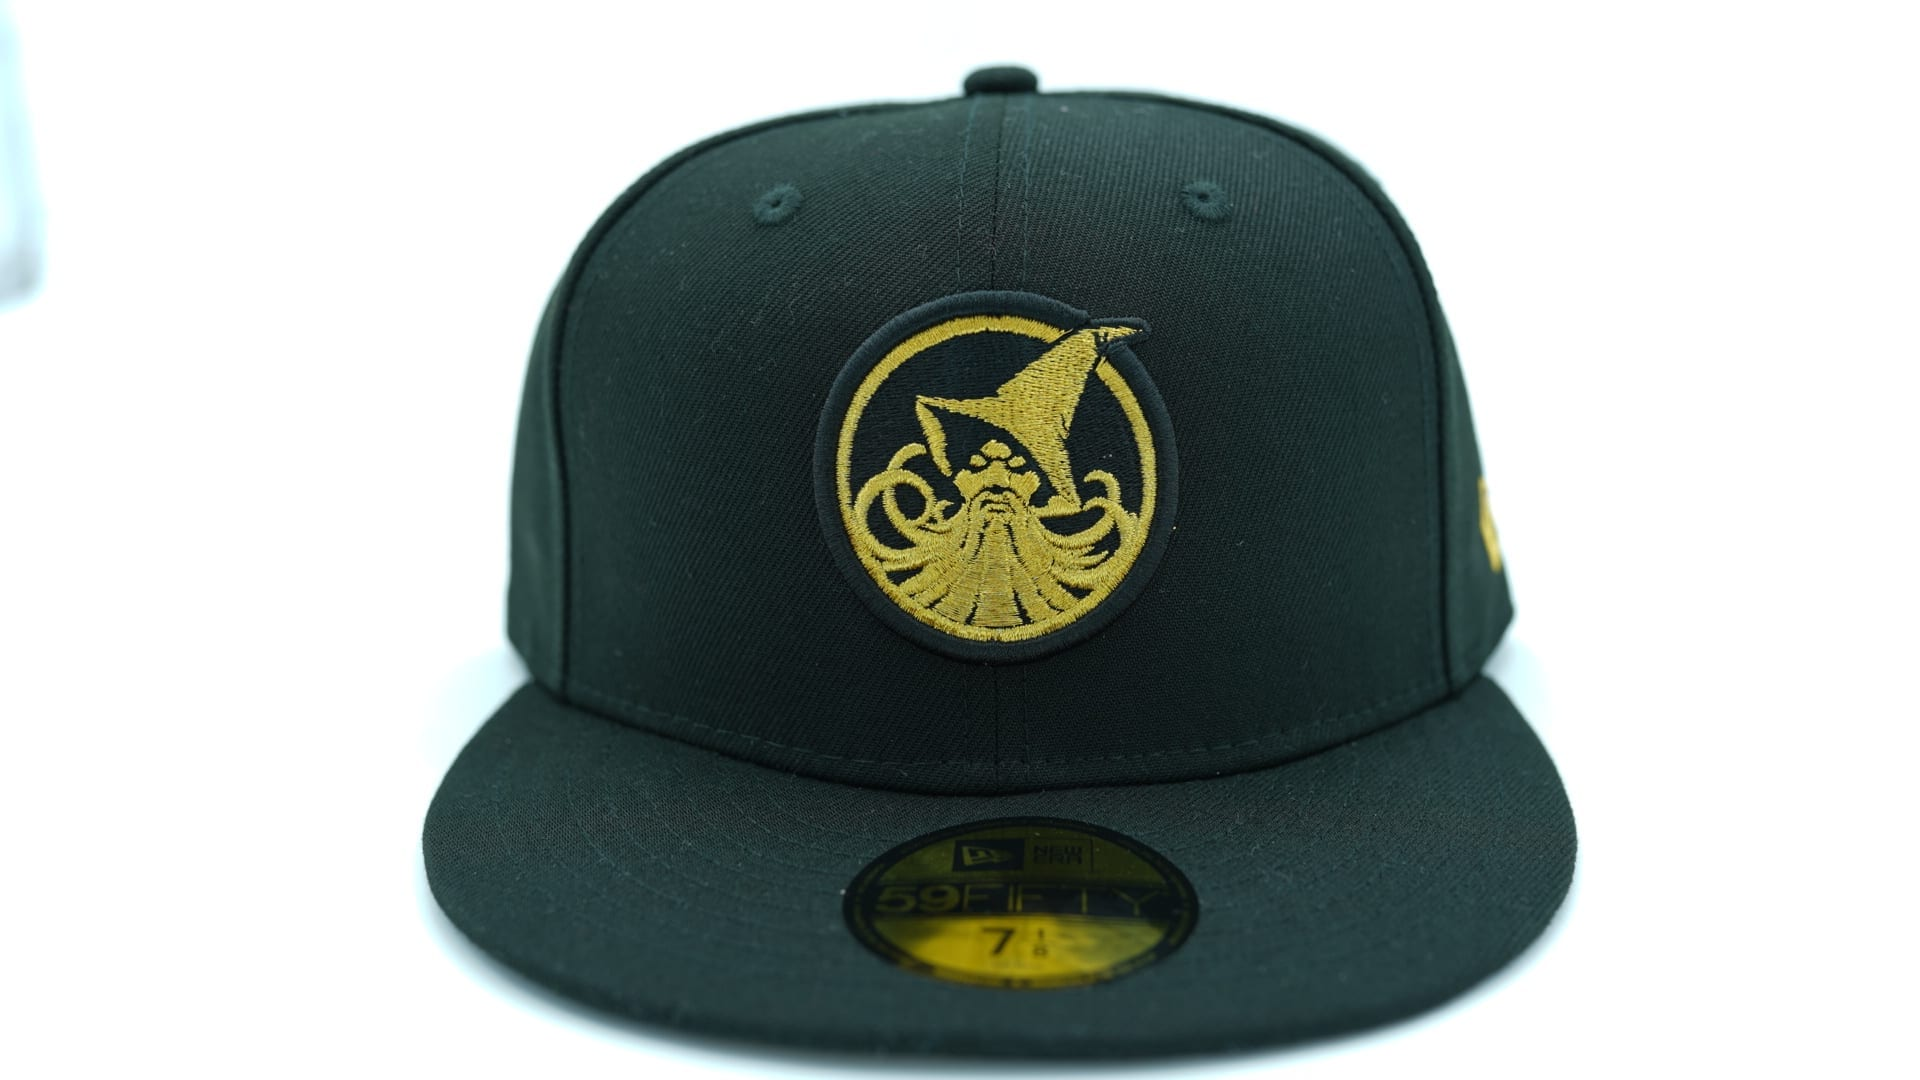 d7a2fd40f23 new england patriots navy beige 59fifty fitted baseball cap new era nfl 1